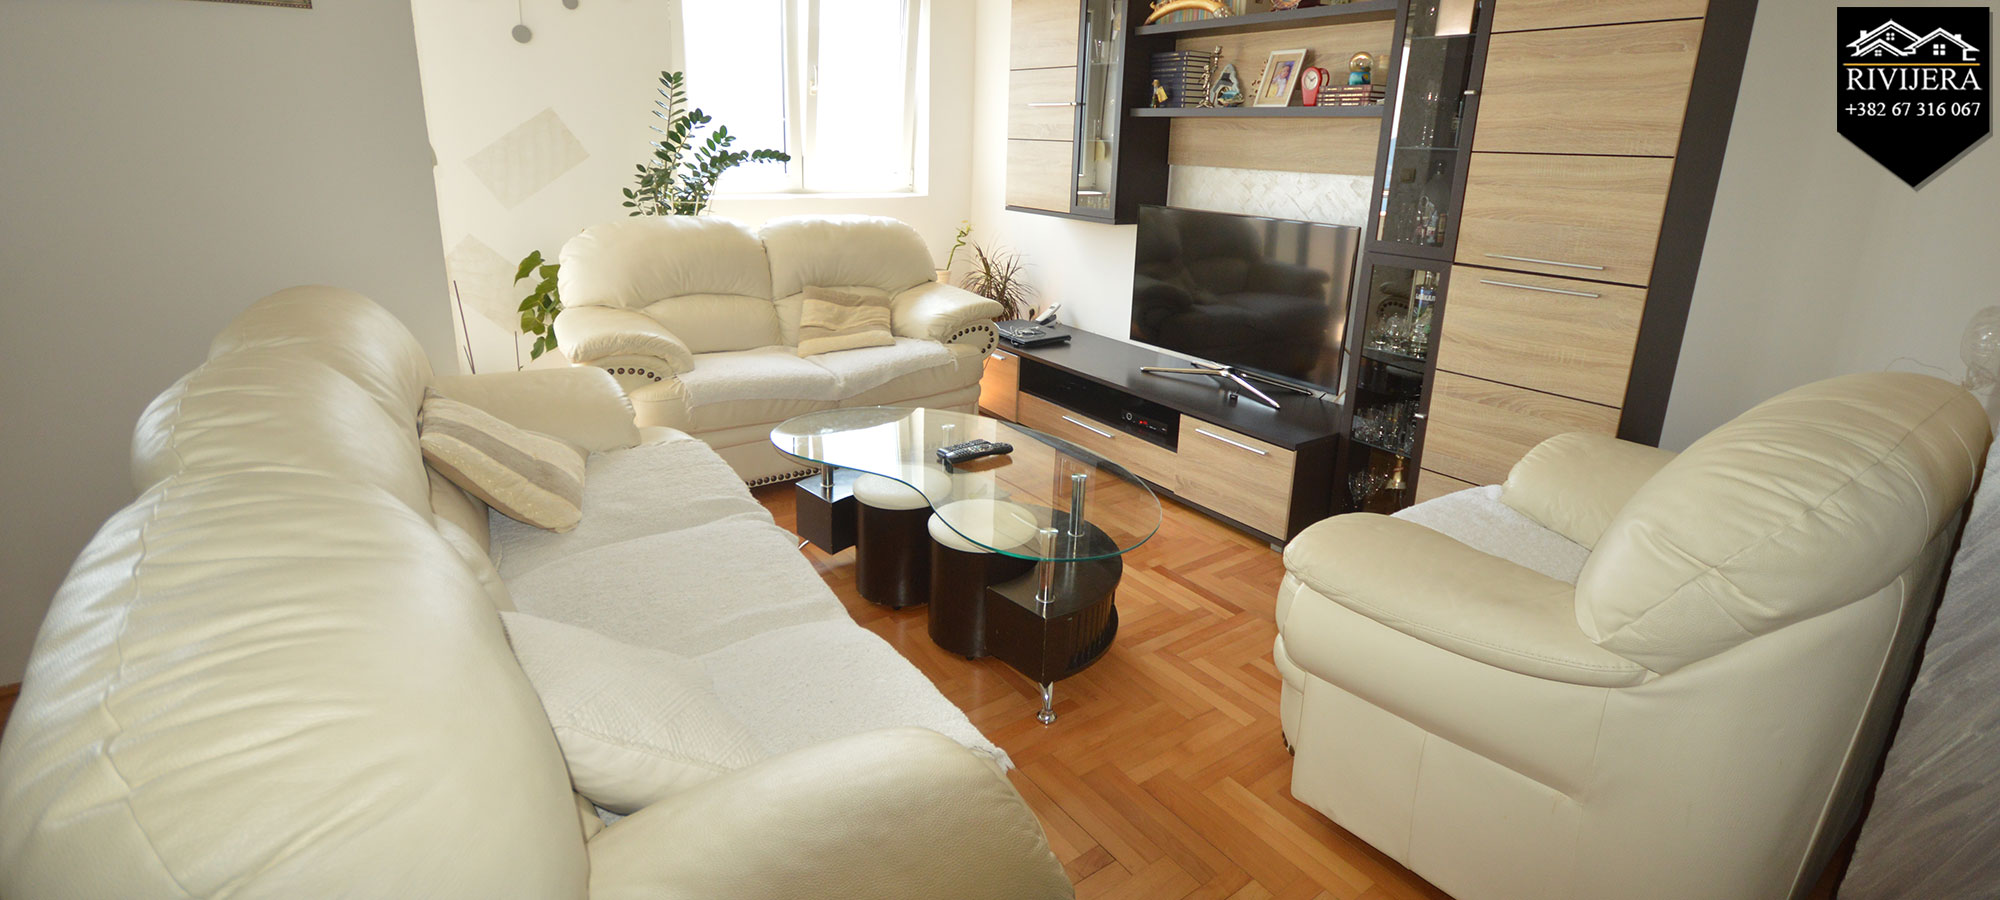 Trosoban stan sa panoramskim pogledom na more centar Herceg Novi